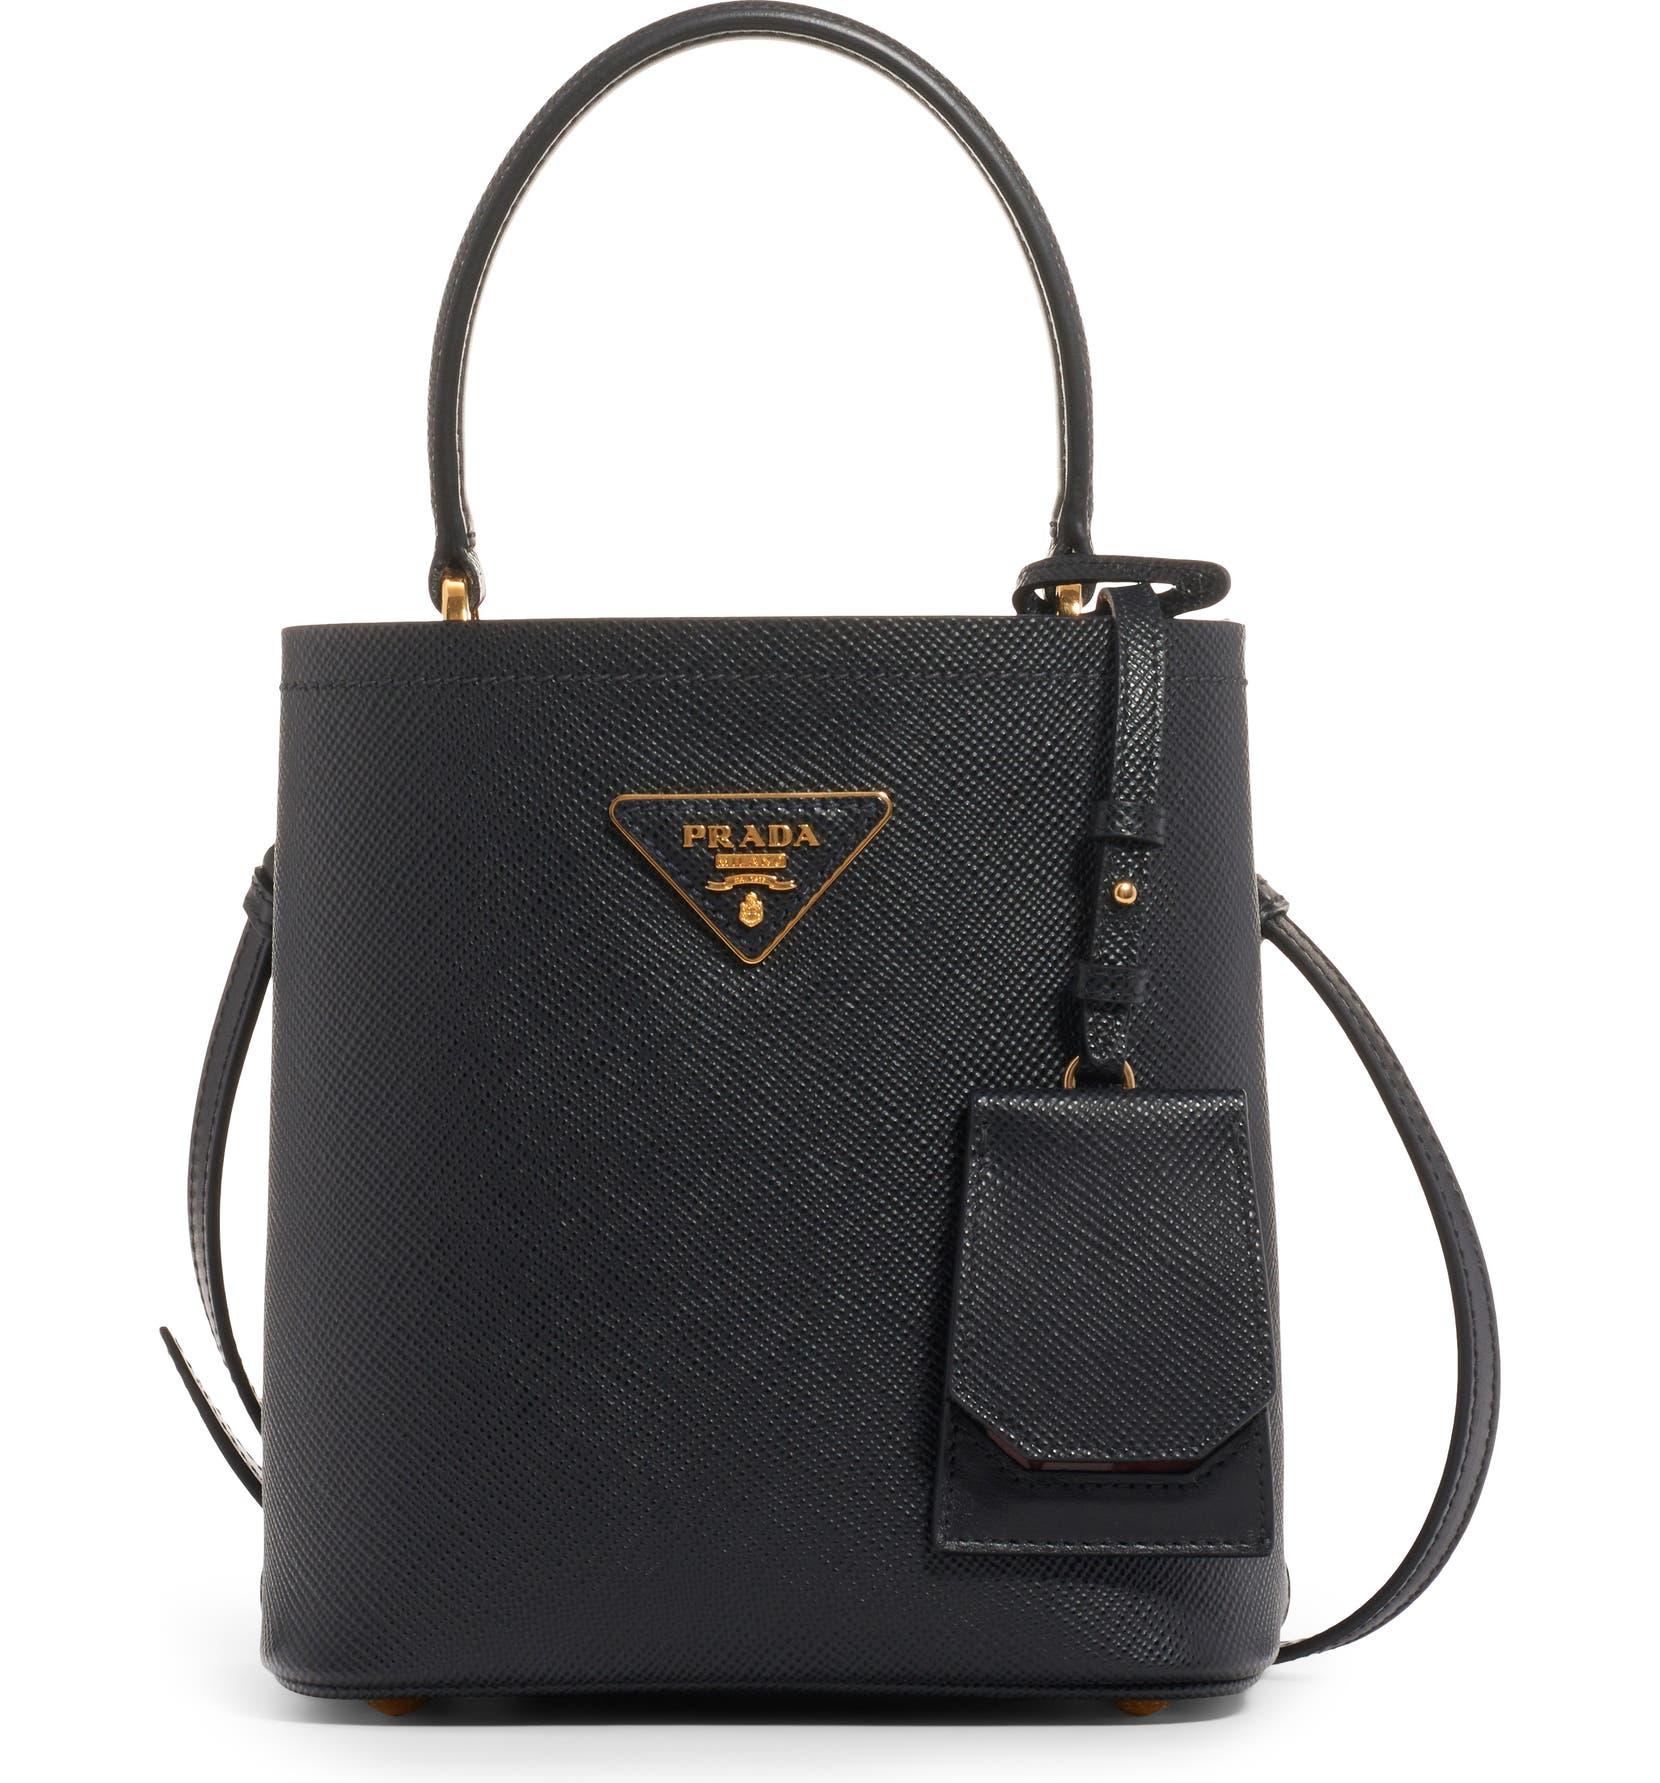 cf333fa91a15 Prada Small Saffiano Leather Bucket Bag | Nordstrom